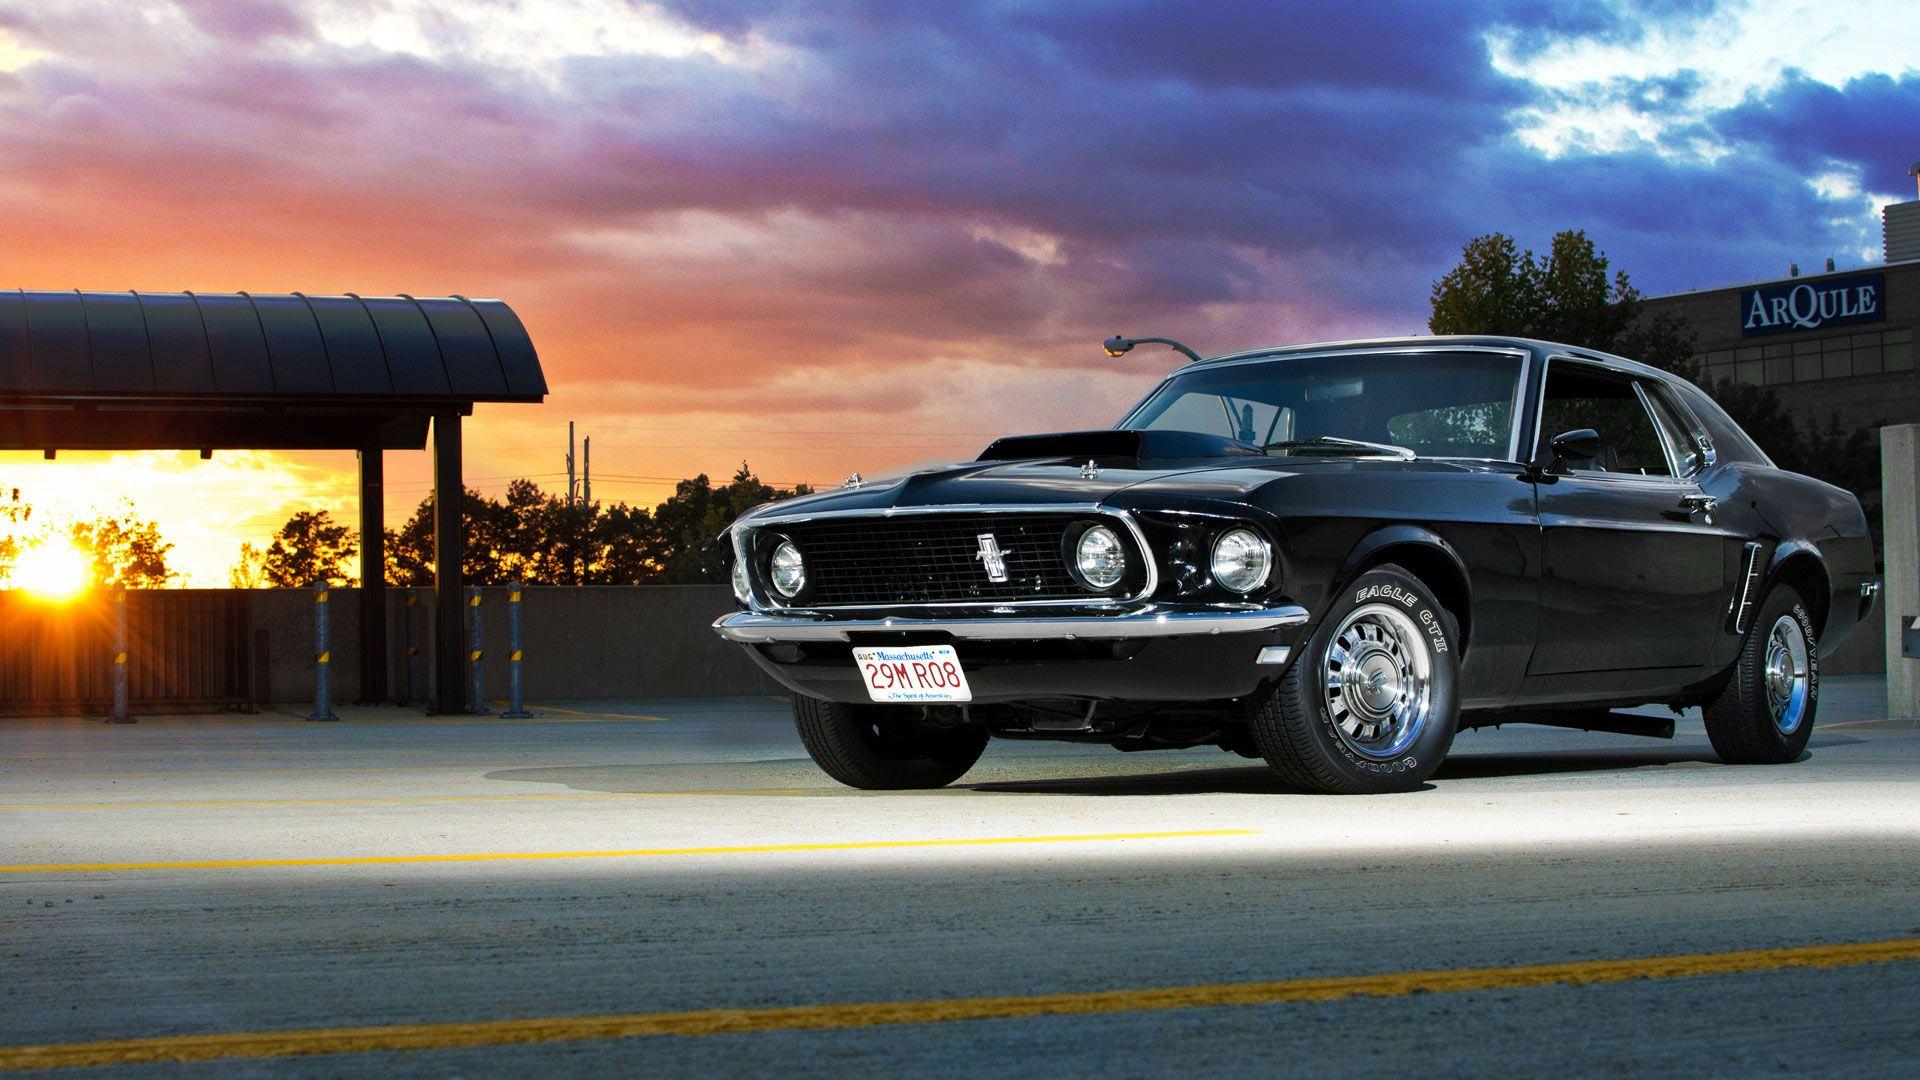 444279 Jpg 1920 1080 Muscle Cars Mustang Mustang Wallpaper Best Muscle Cars